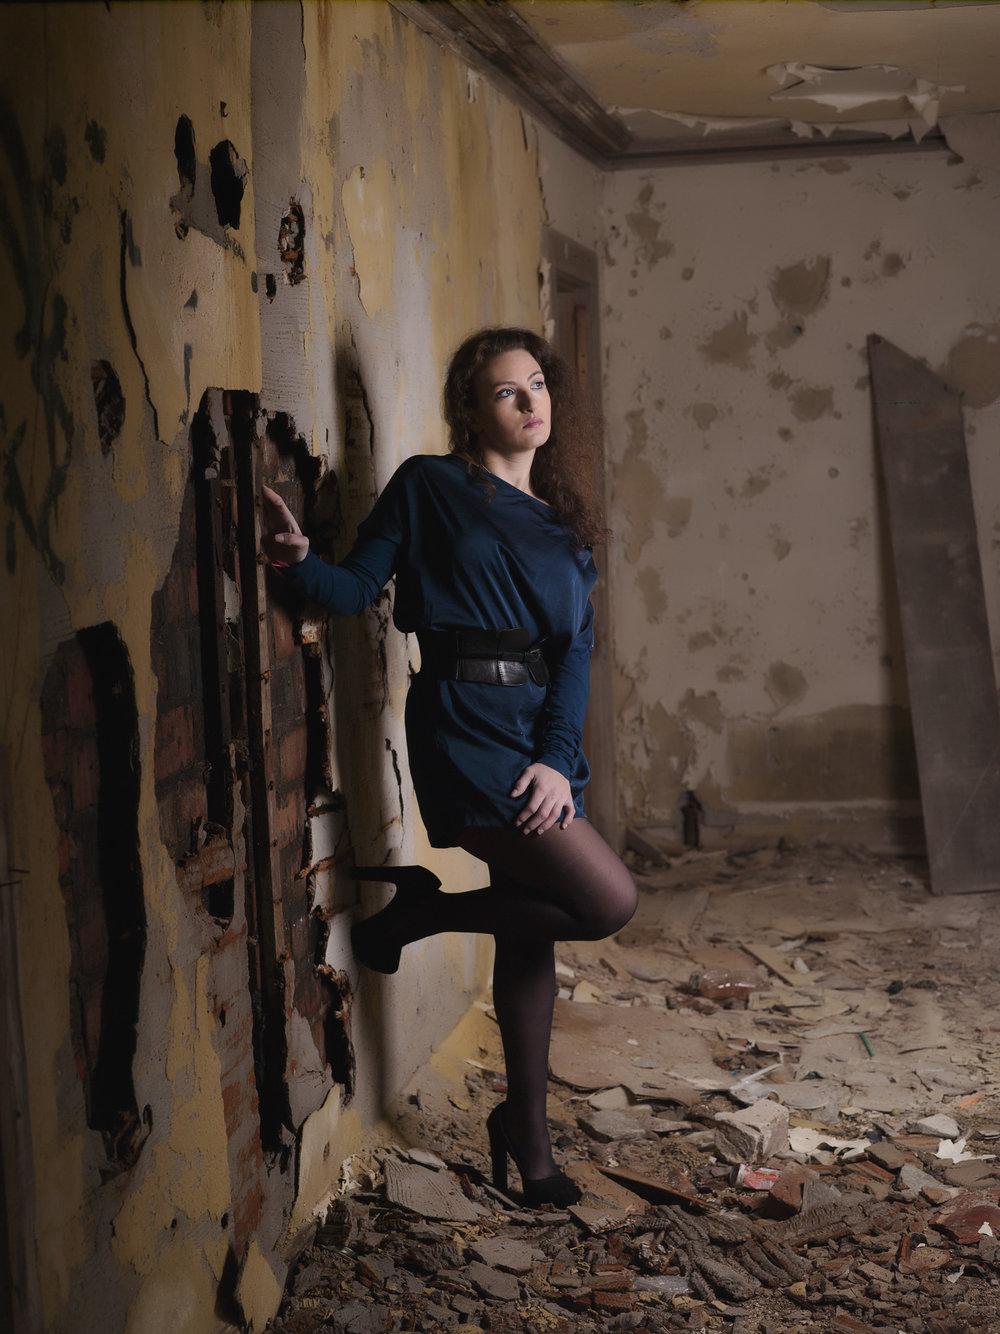 Model: Sandra Viejo  Camera used: Mamiya 645AFD  Digital Back: Aptus22